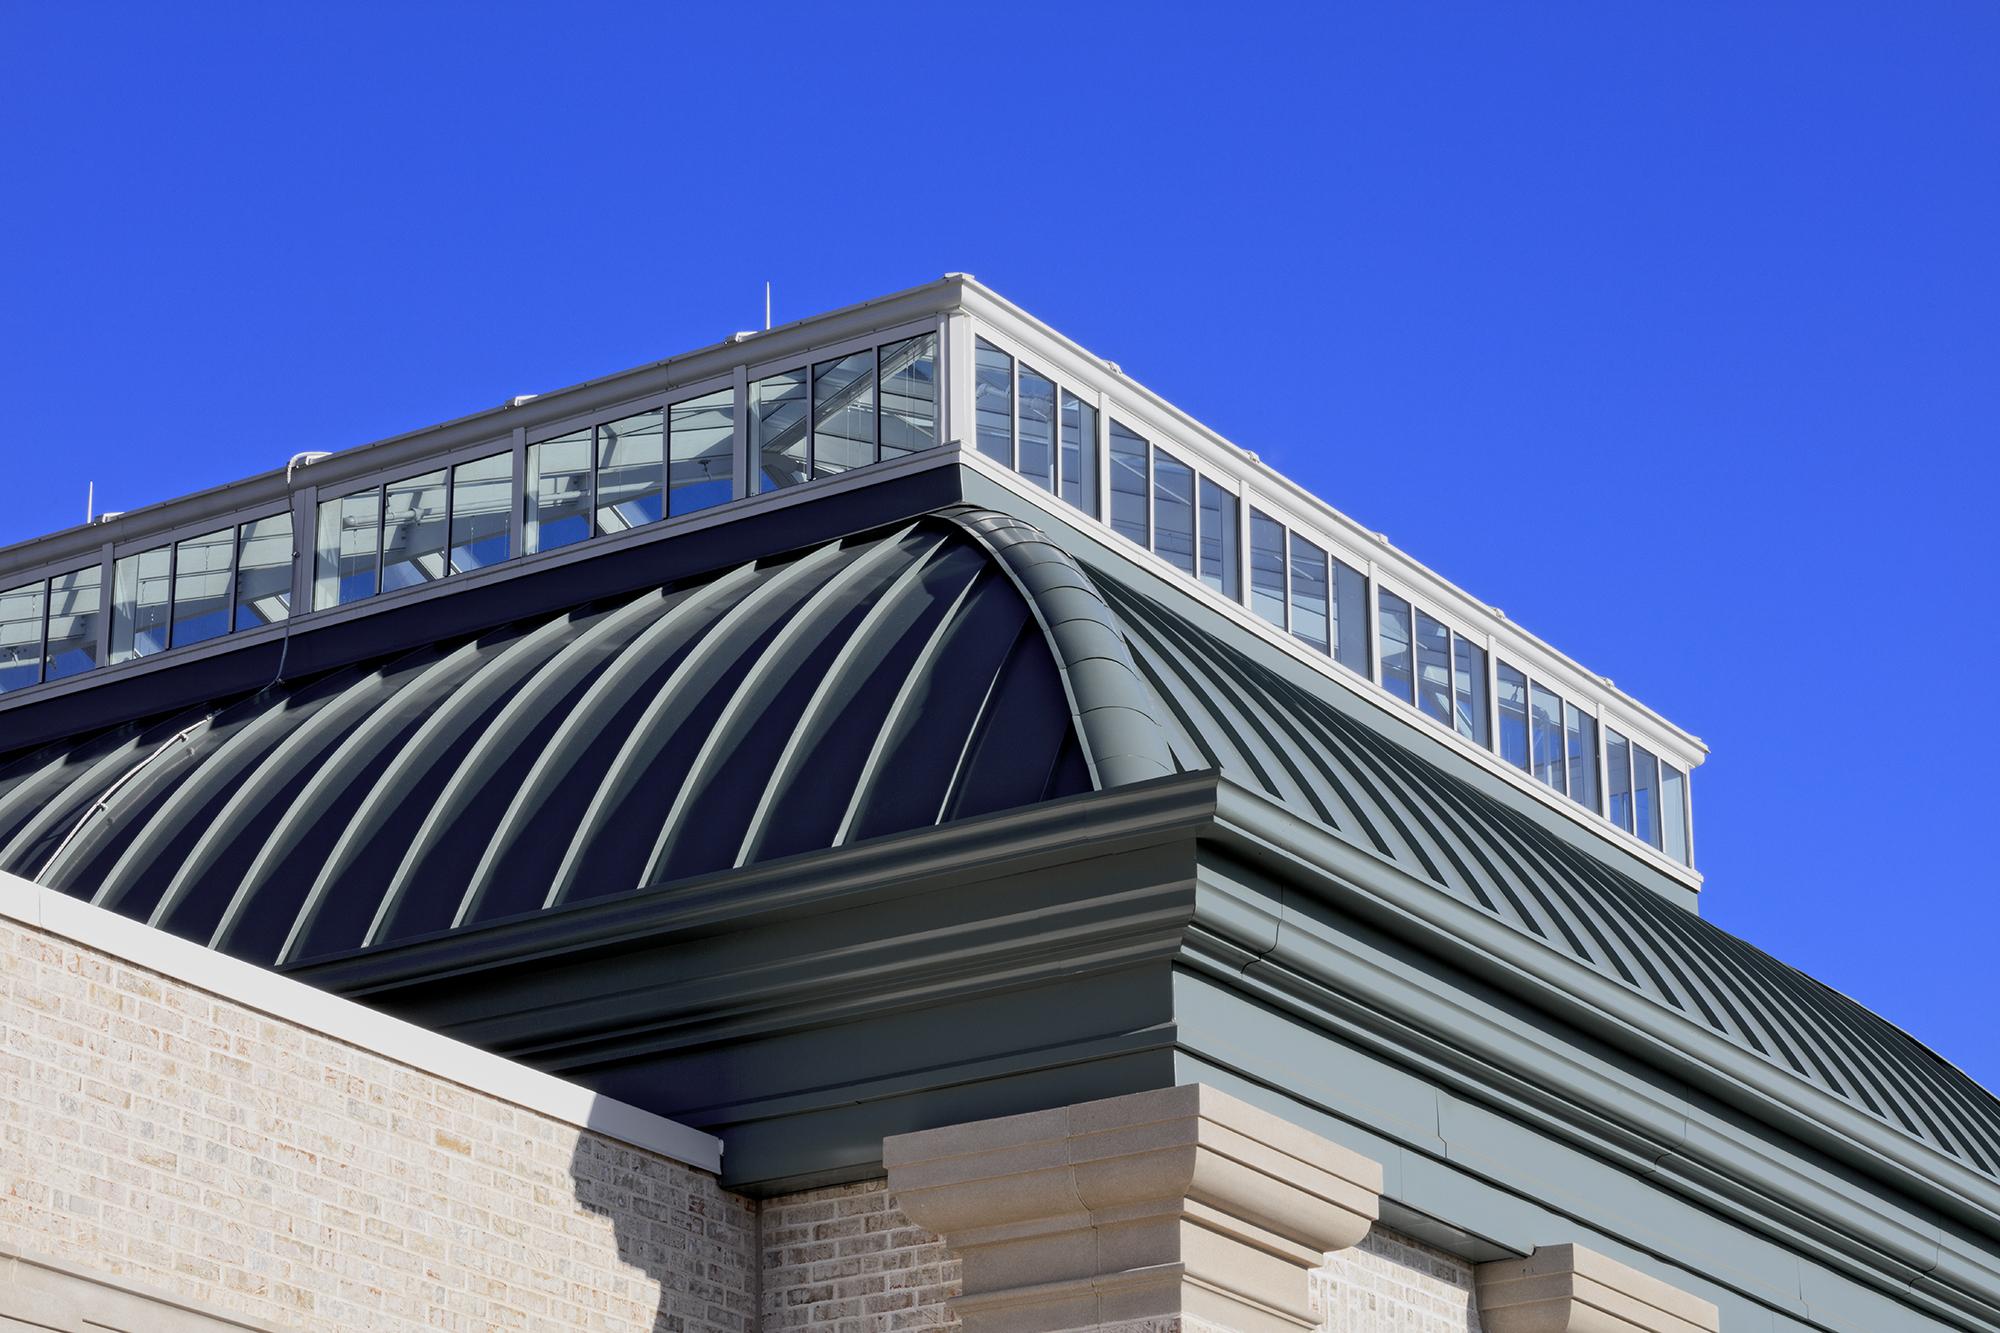 Hershey Gardens roof